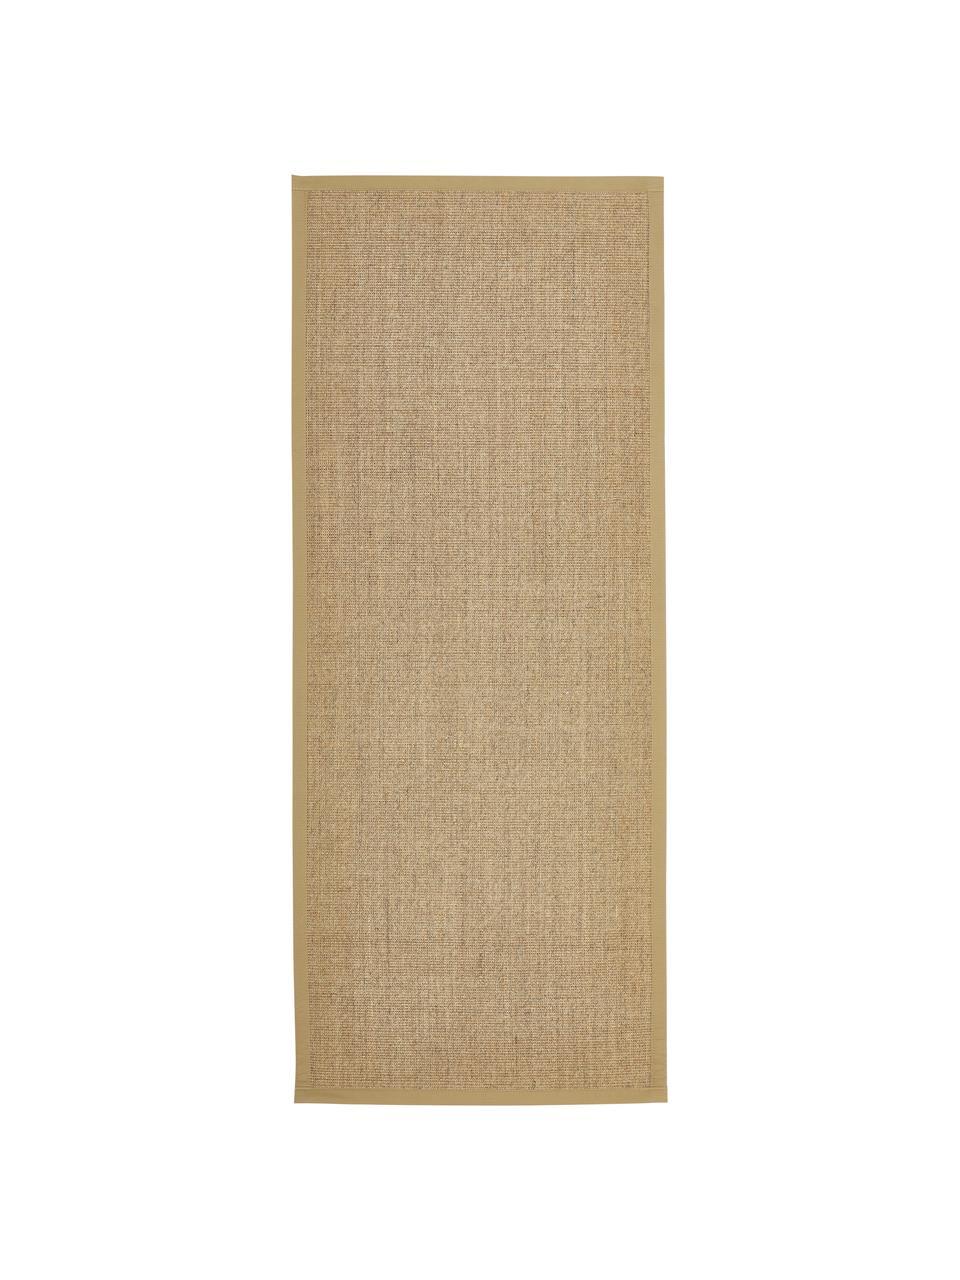 Tapis de couloir sisal beige Leonie, Beige